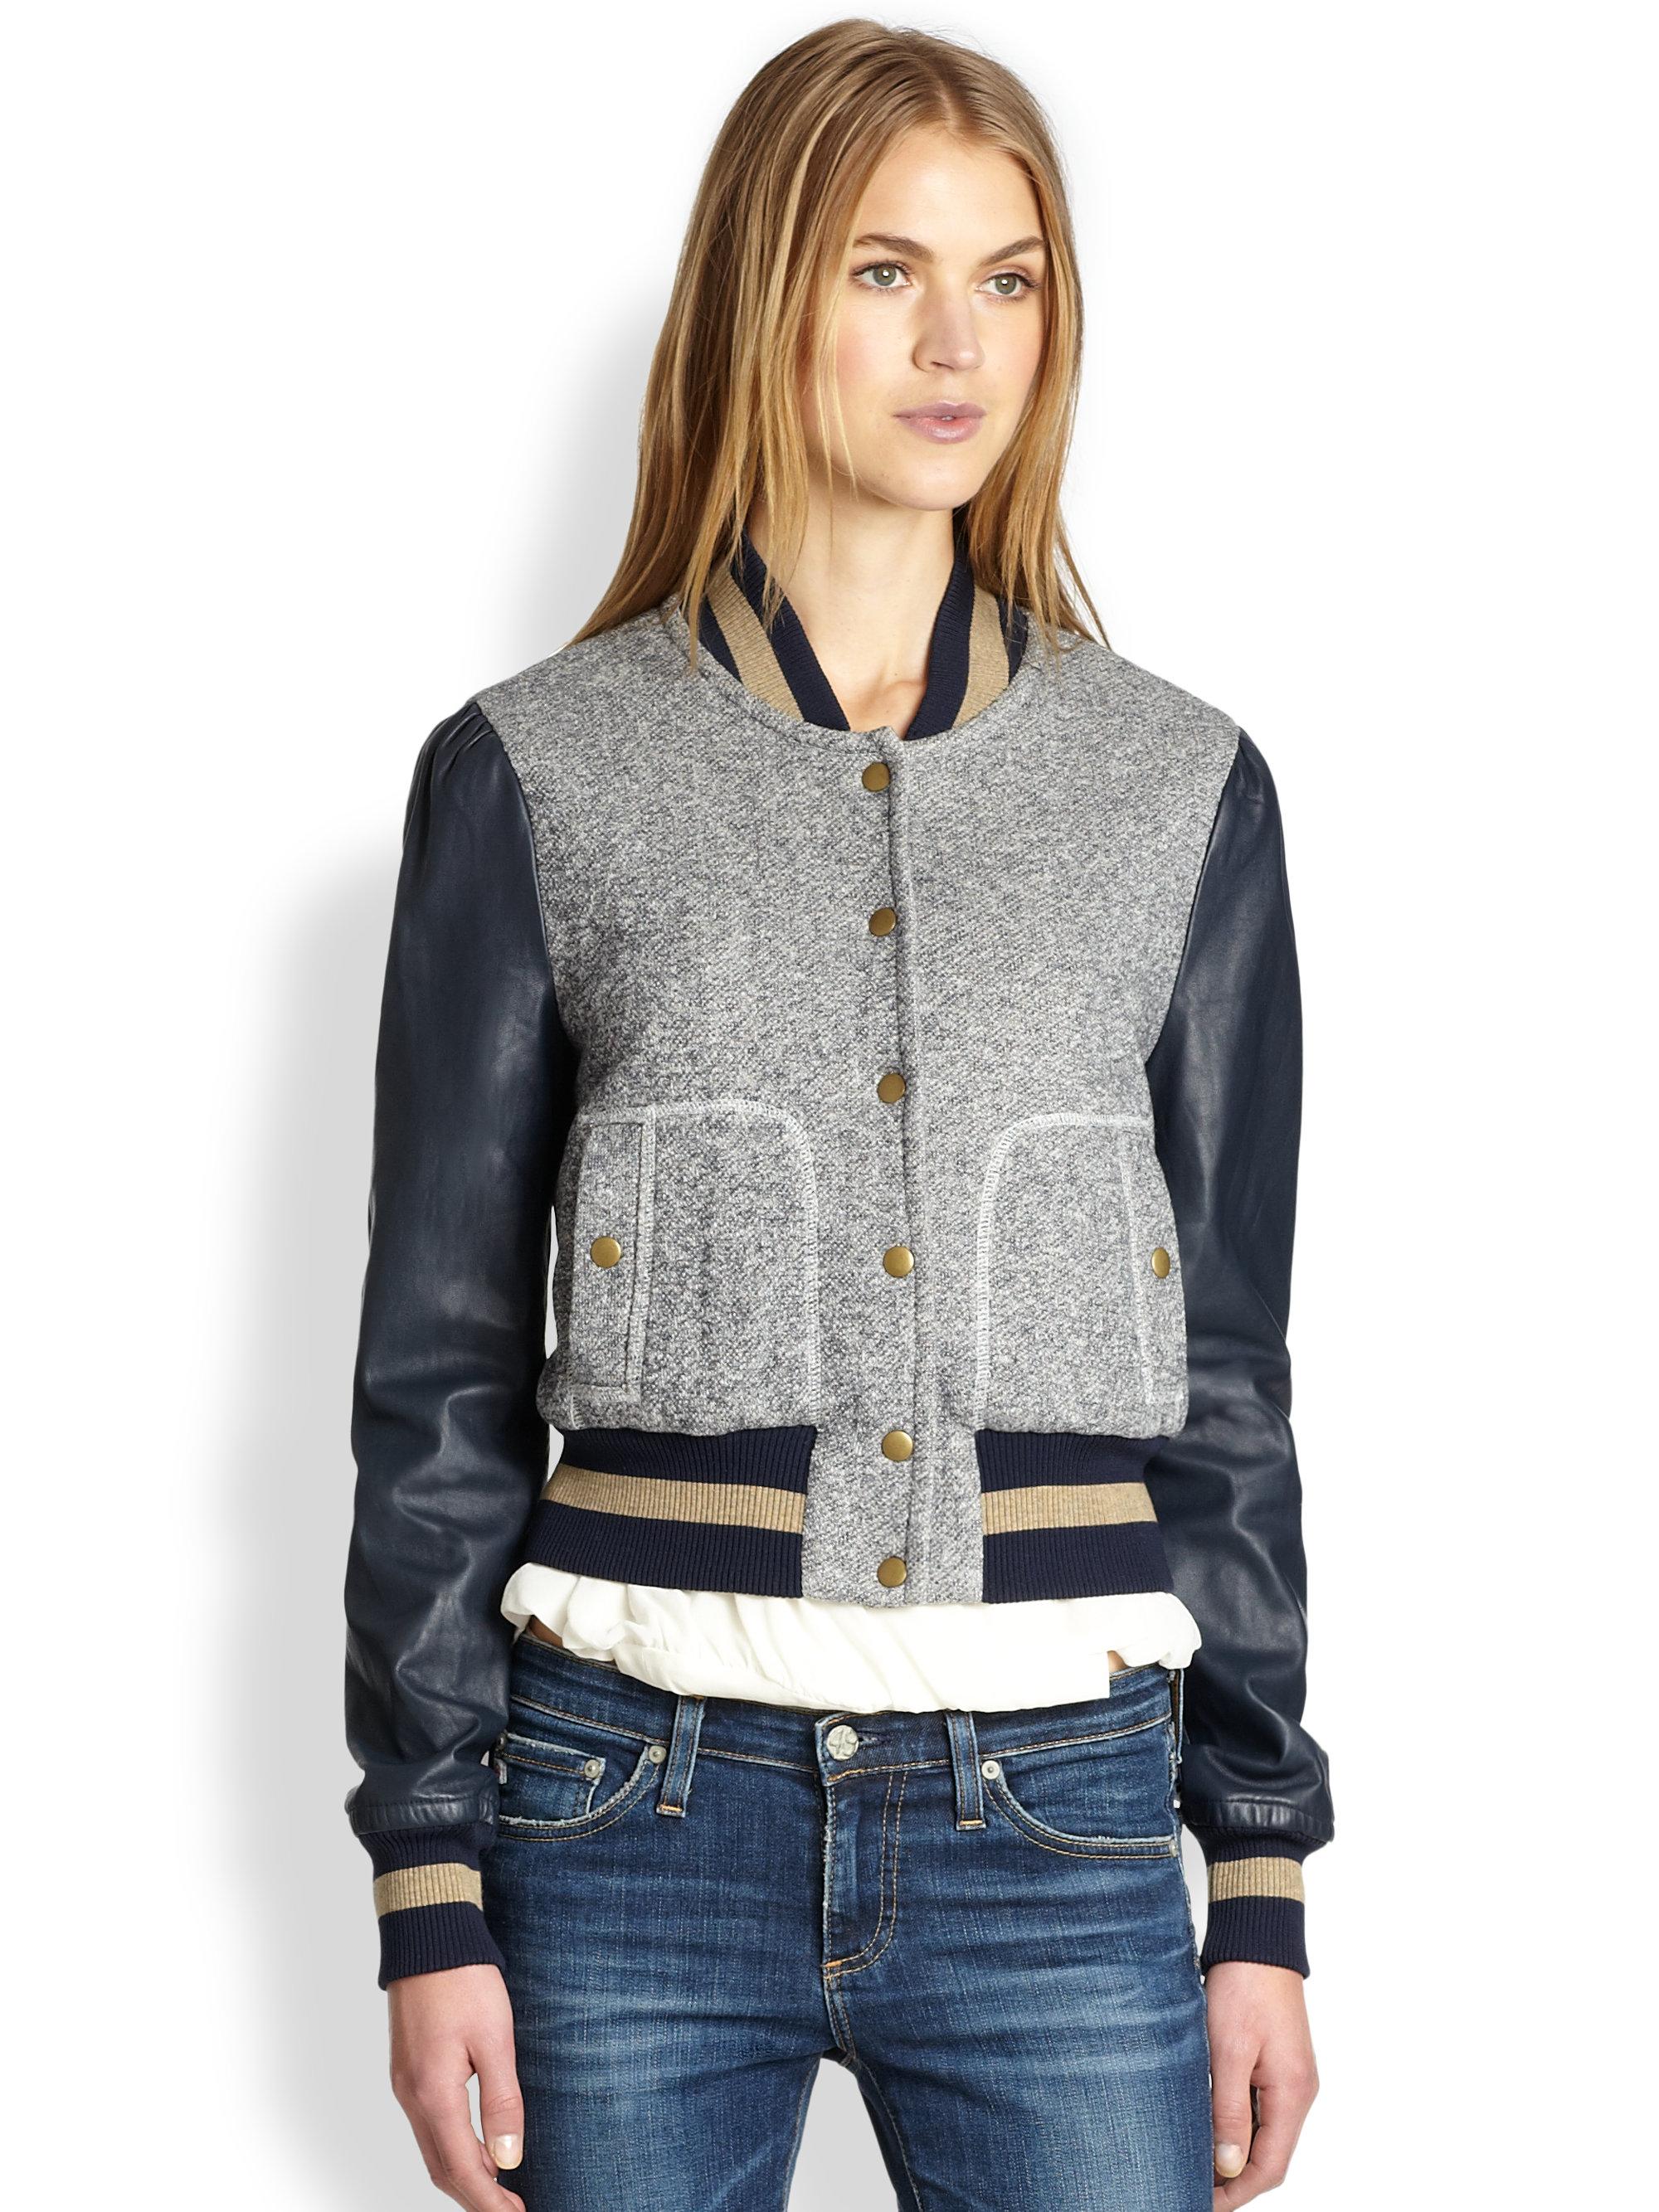 Rachel Zoe Ryder Leather Sleeve Baseball Jacket In Gray  Lyst-5883